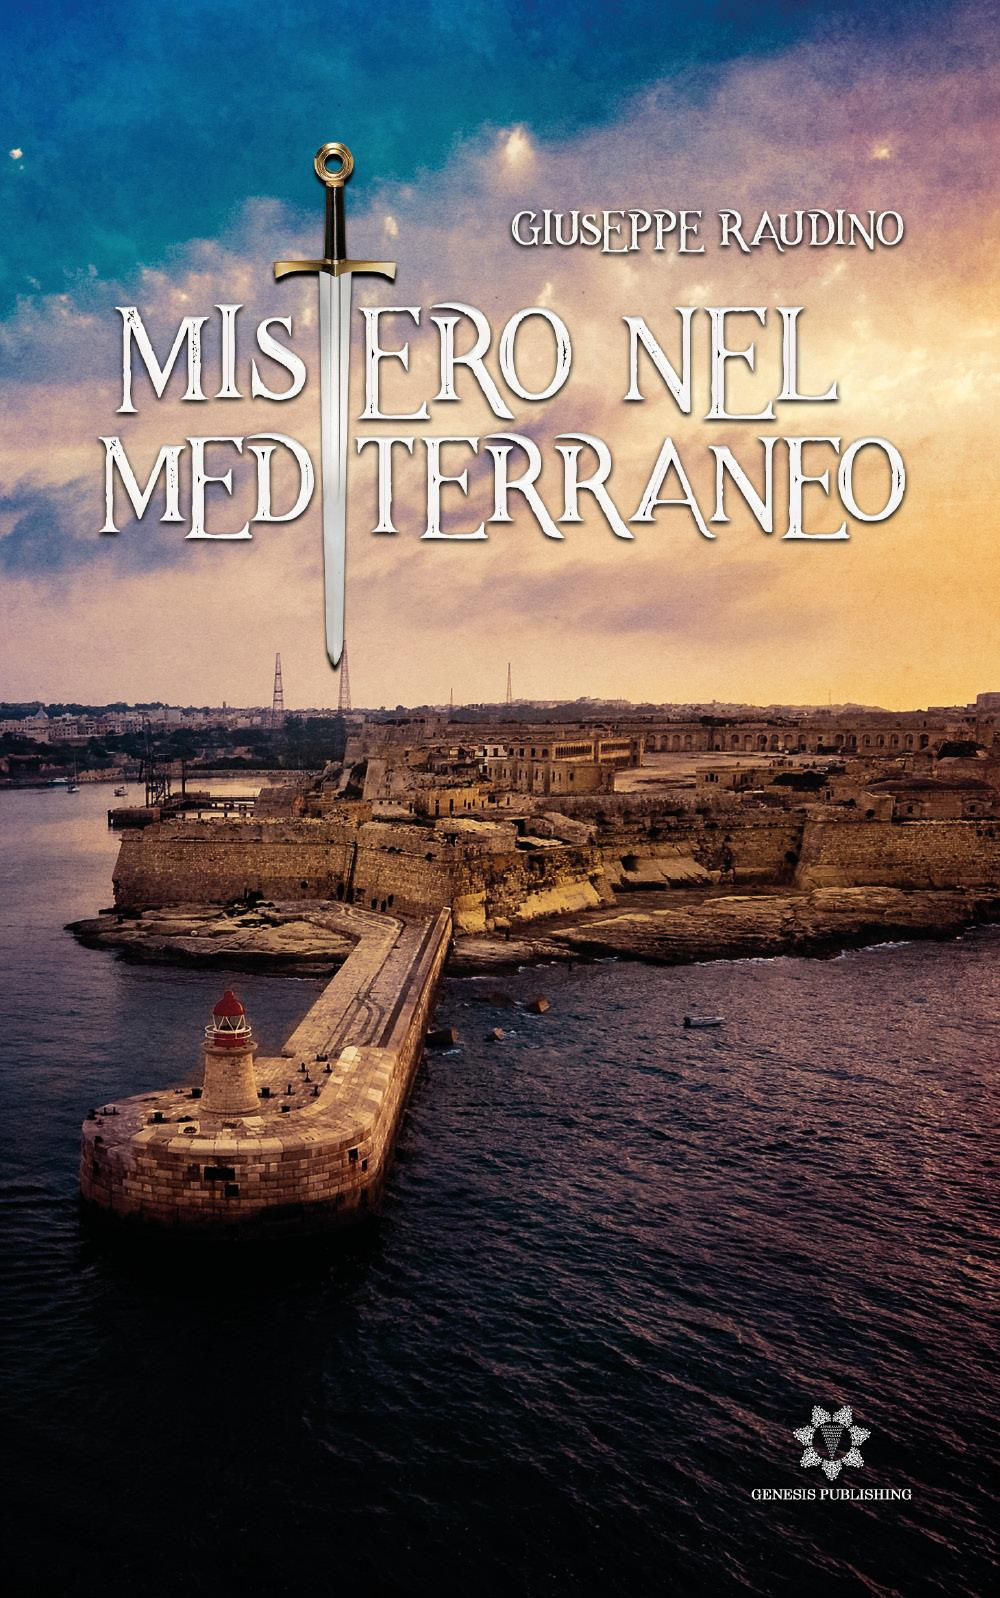 Mistero nel Mediterraneo